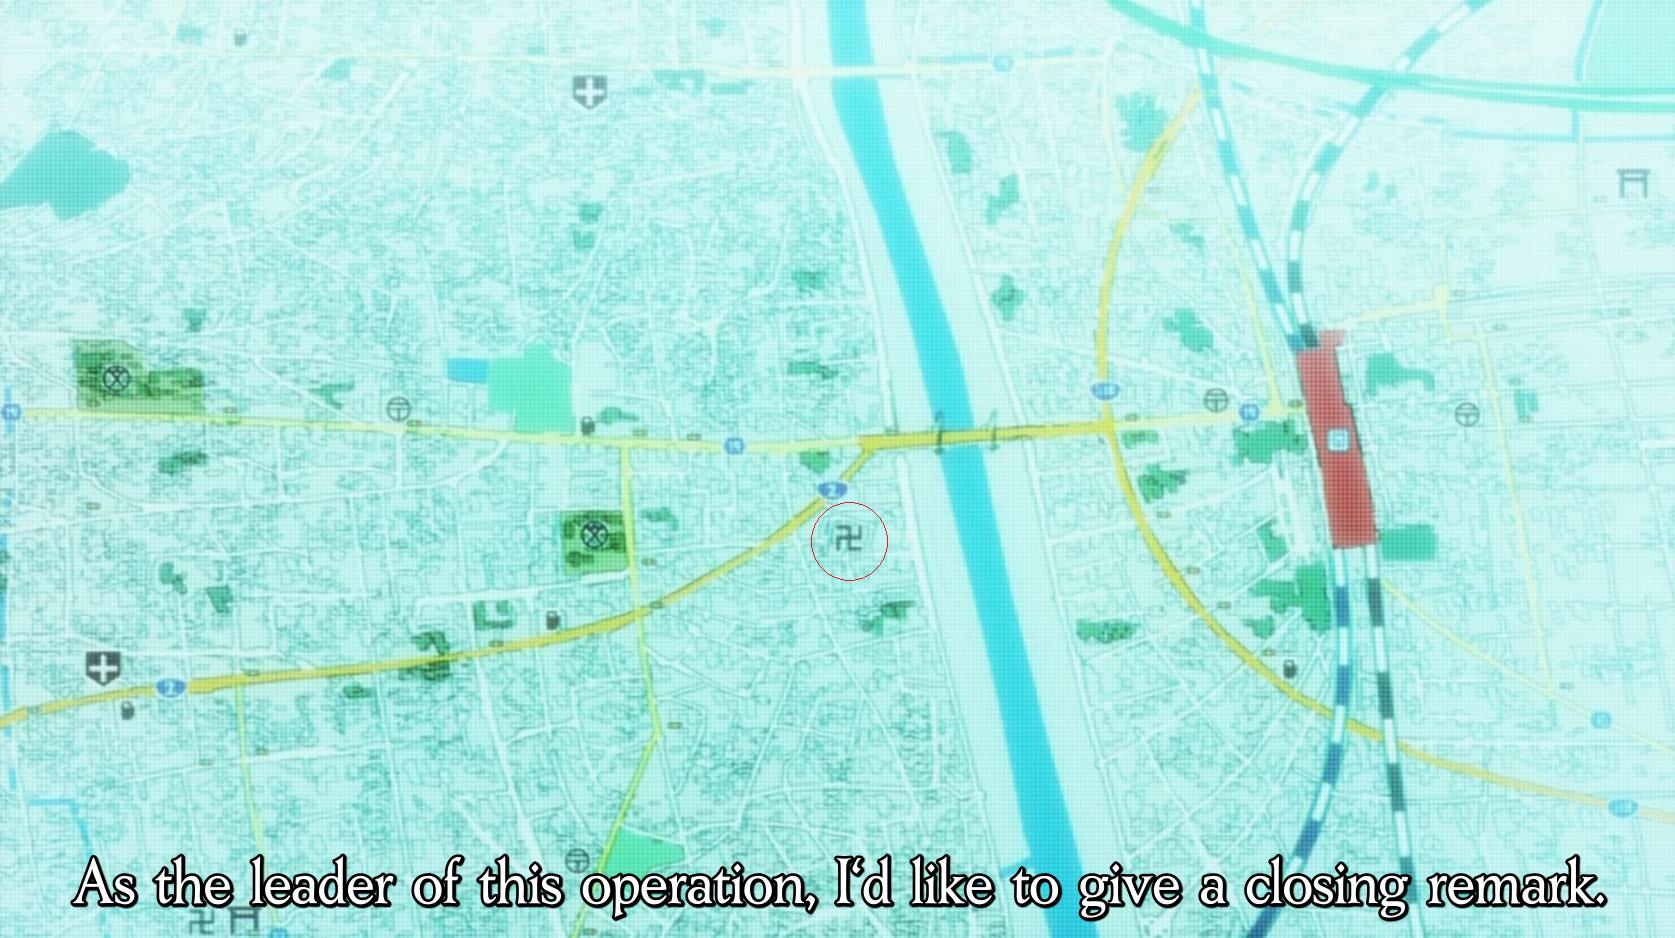 Nazis are everywhere. Shakugan no Shana F ep18.. Gnetlemn, ve are Nazis Nazis in Anime Damn it Hitler